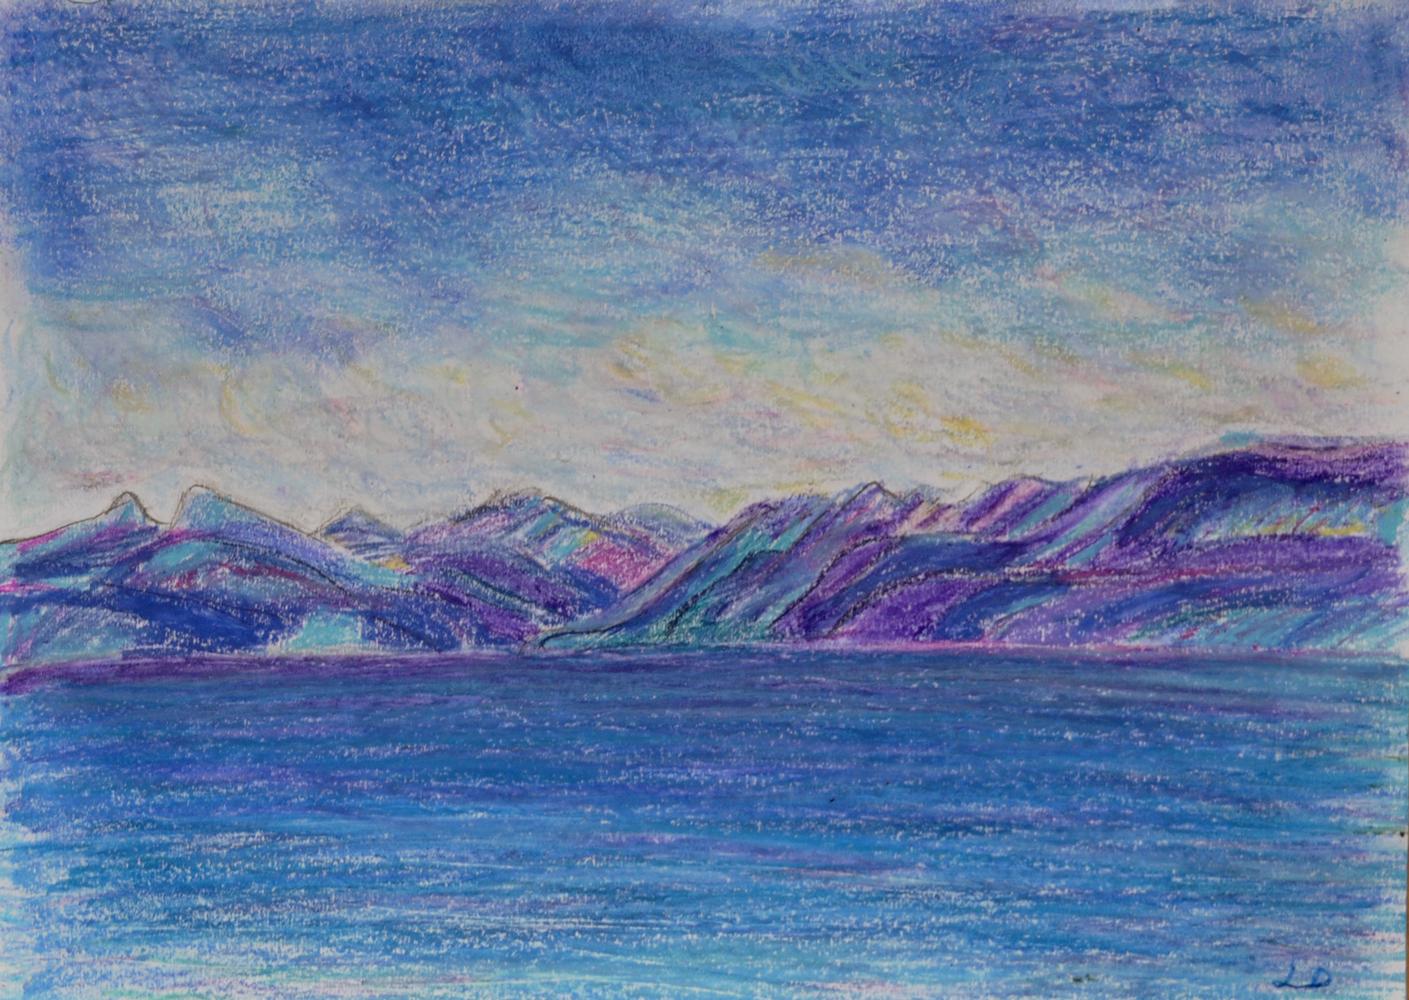 Lake Geneva, St Prex no. 8. Mixed media on paper, 21x30, 2018